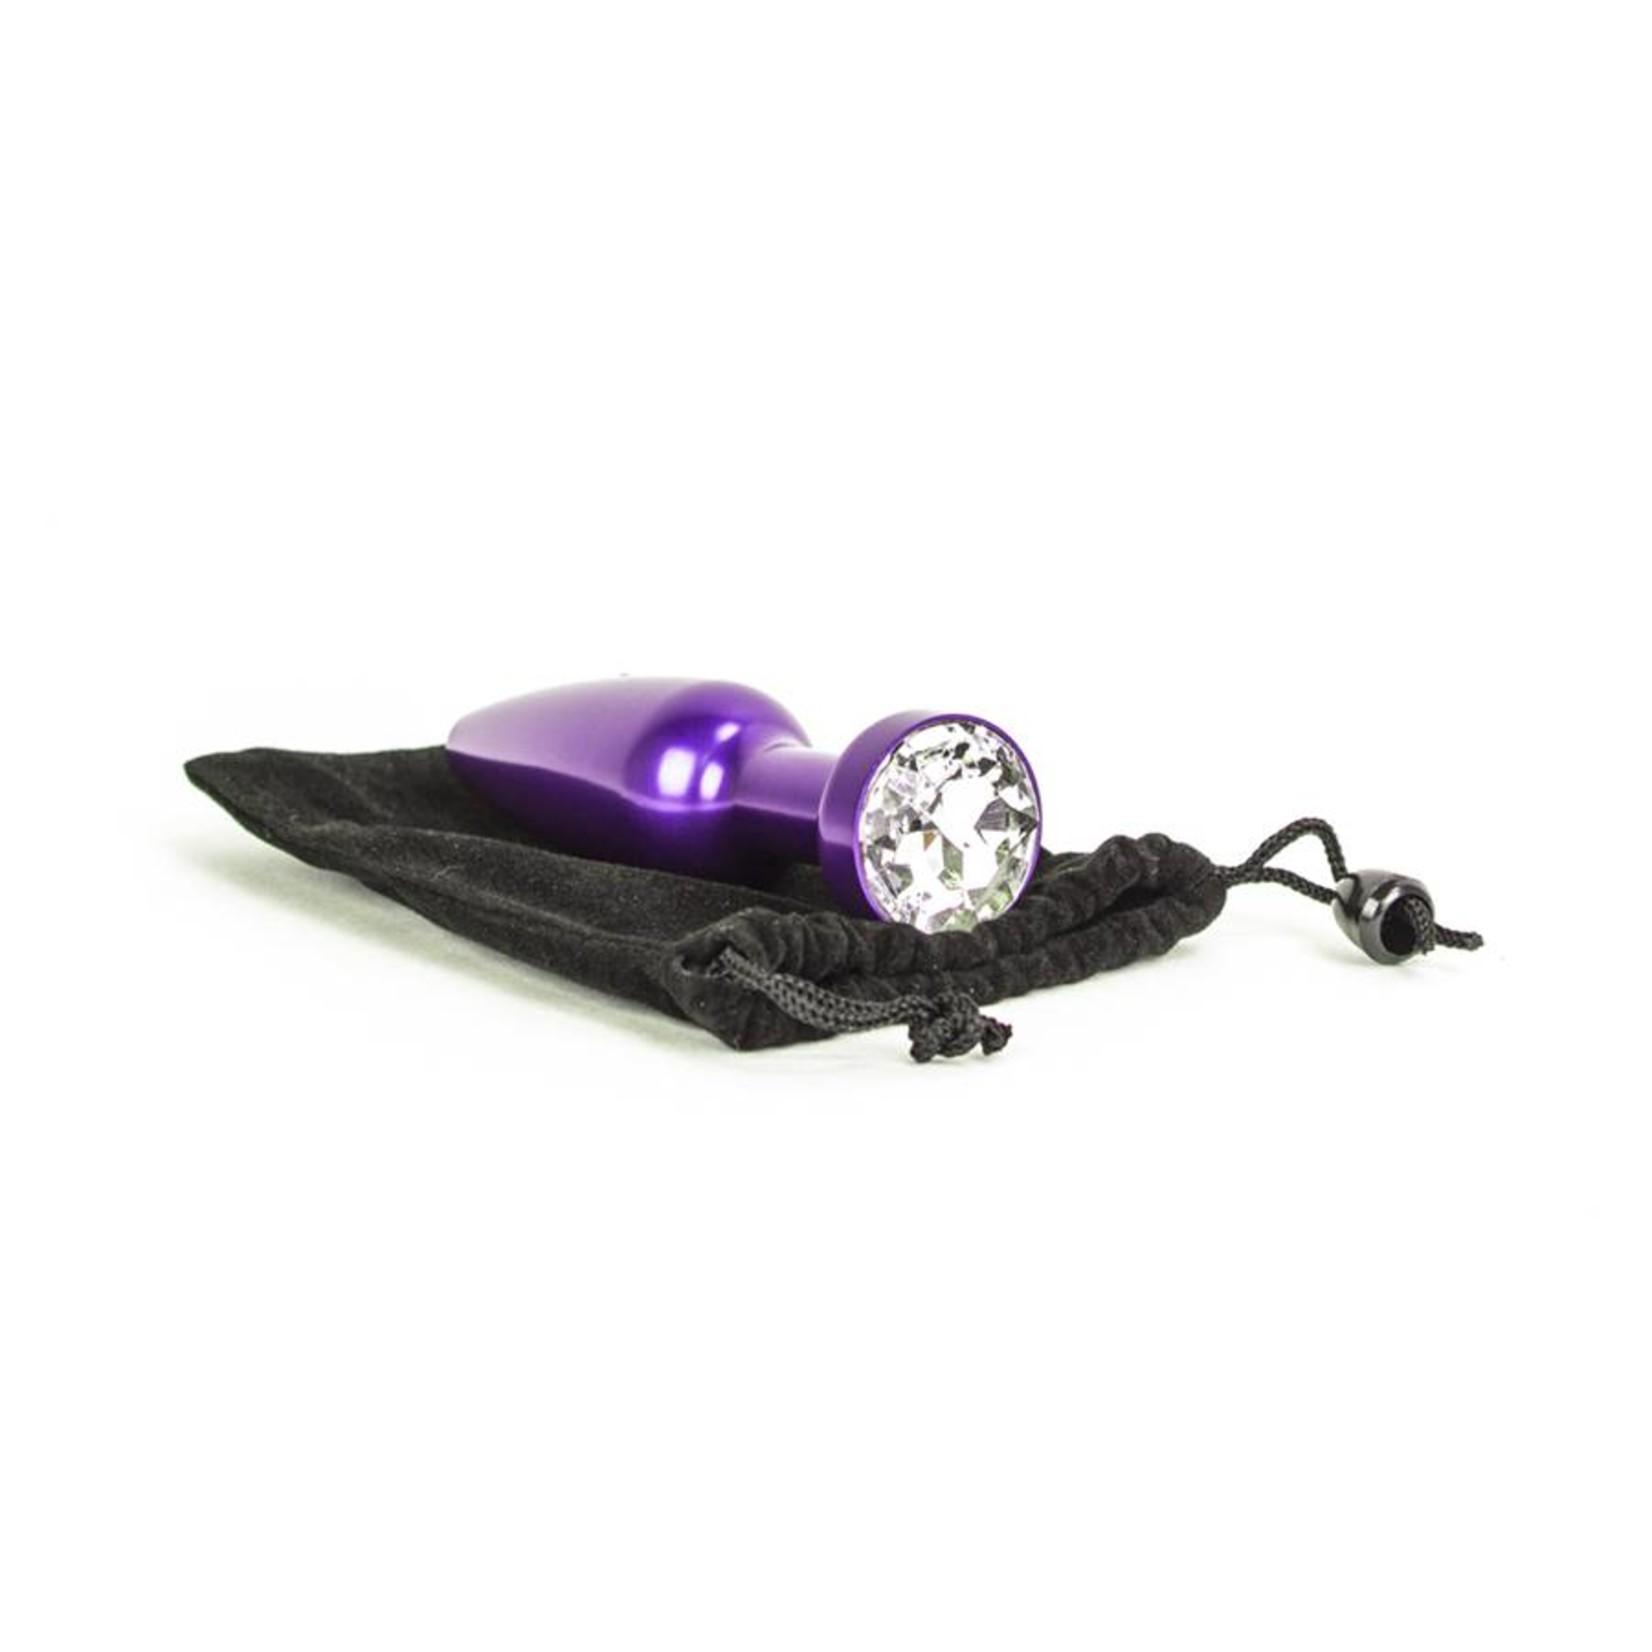 KIOTOS Aluminum Alloy Anal Plug 2 - Purple